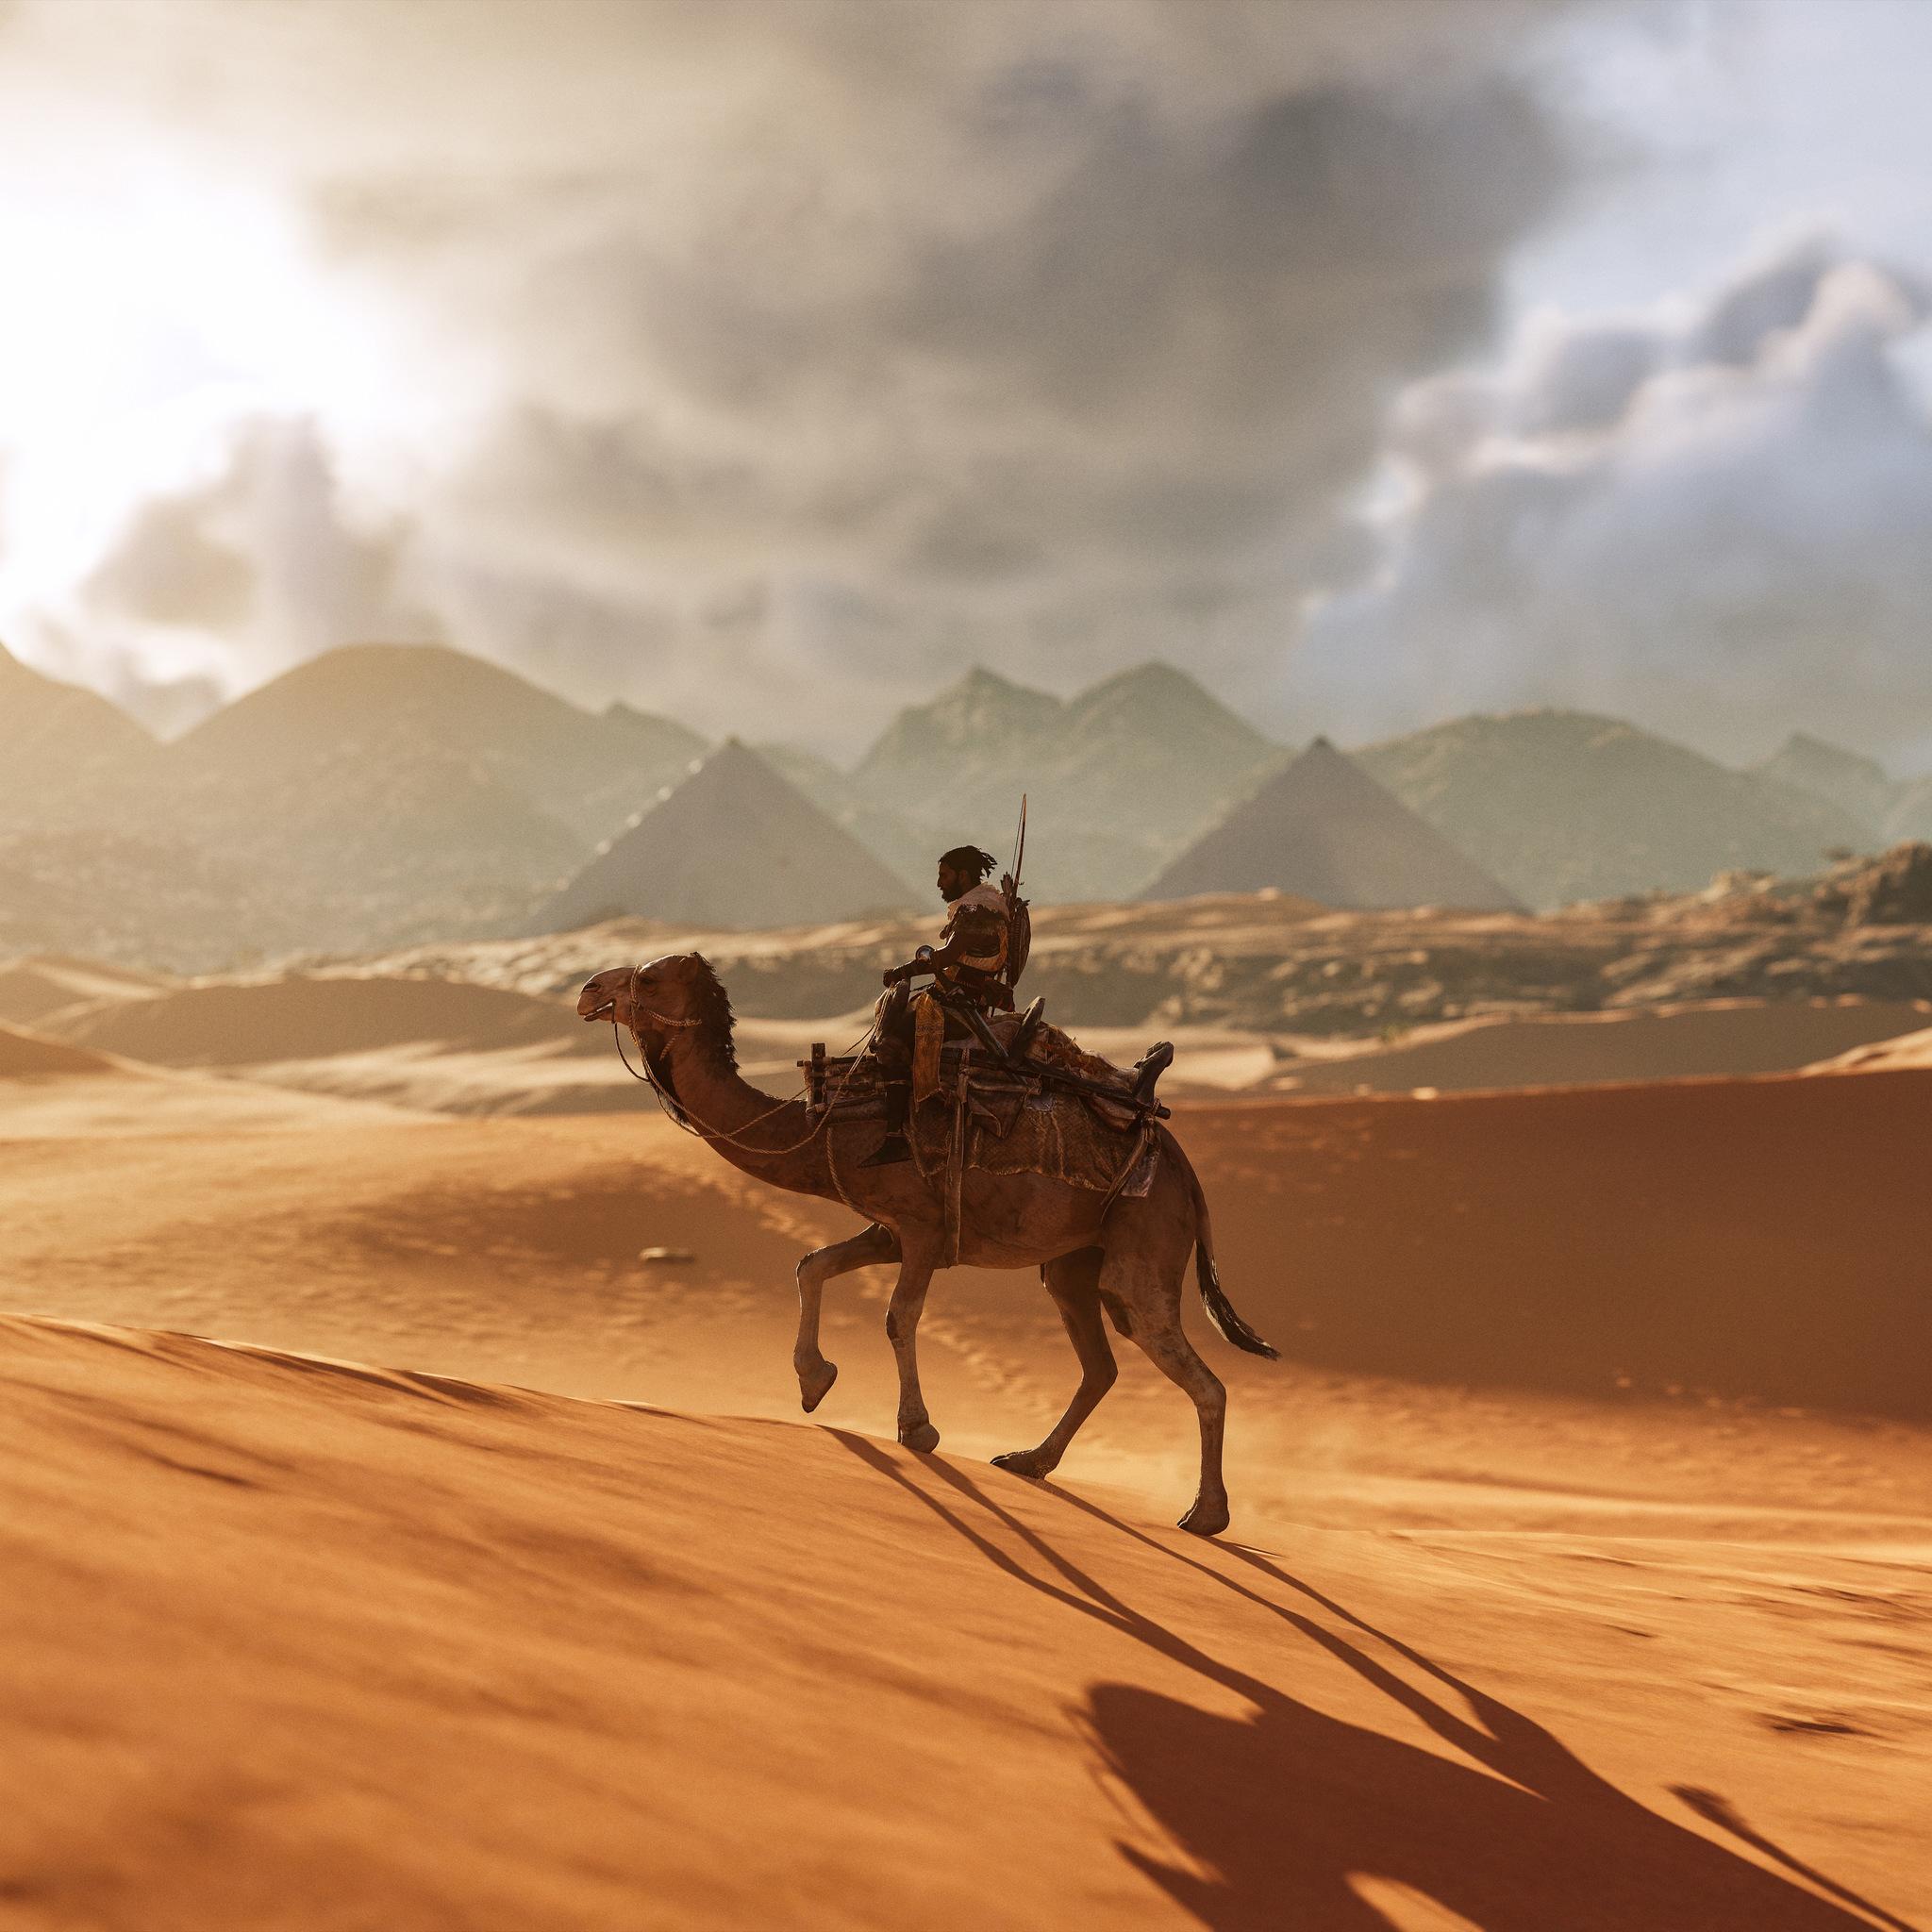 Camel Assassins Creed Origins